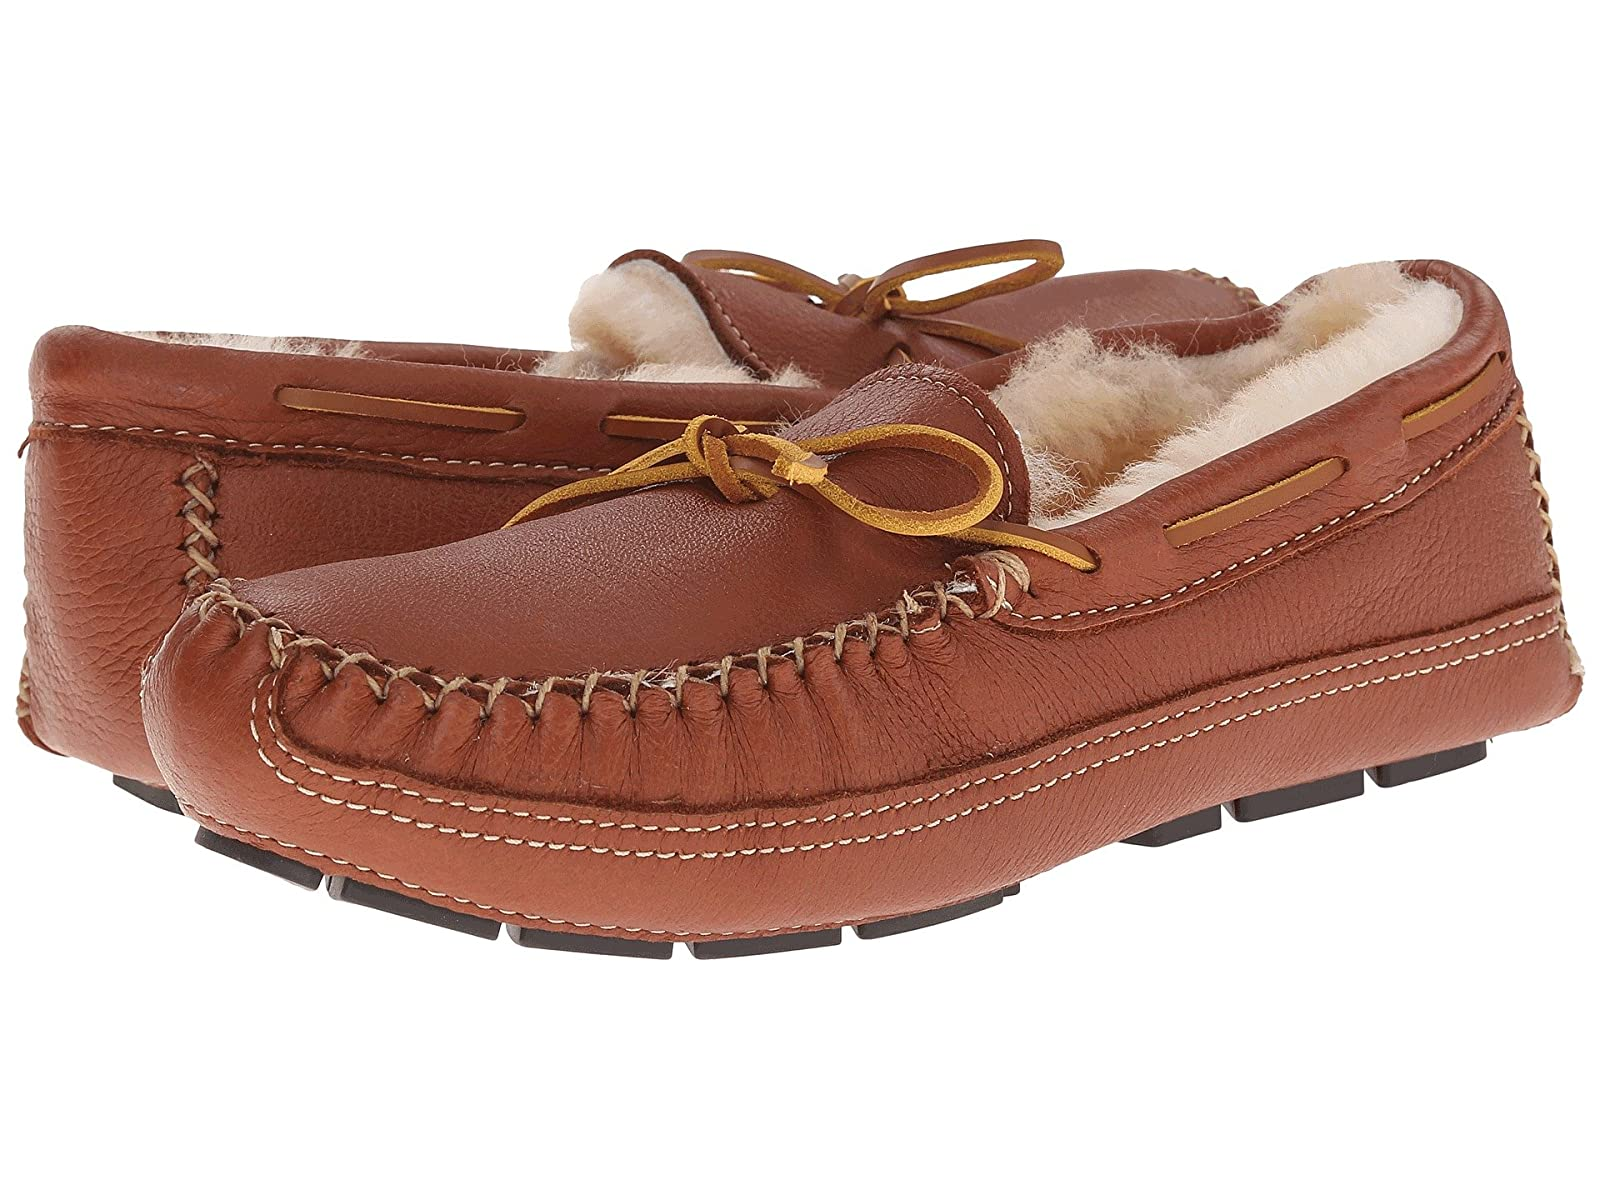 Minnetonka Sheepskin Lined Moose SlipperAtmospheric grades have affordable shoes